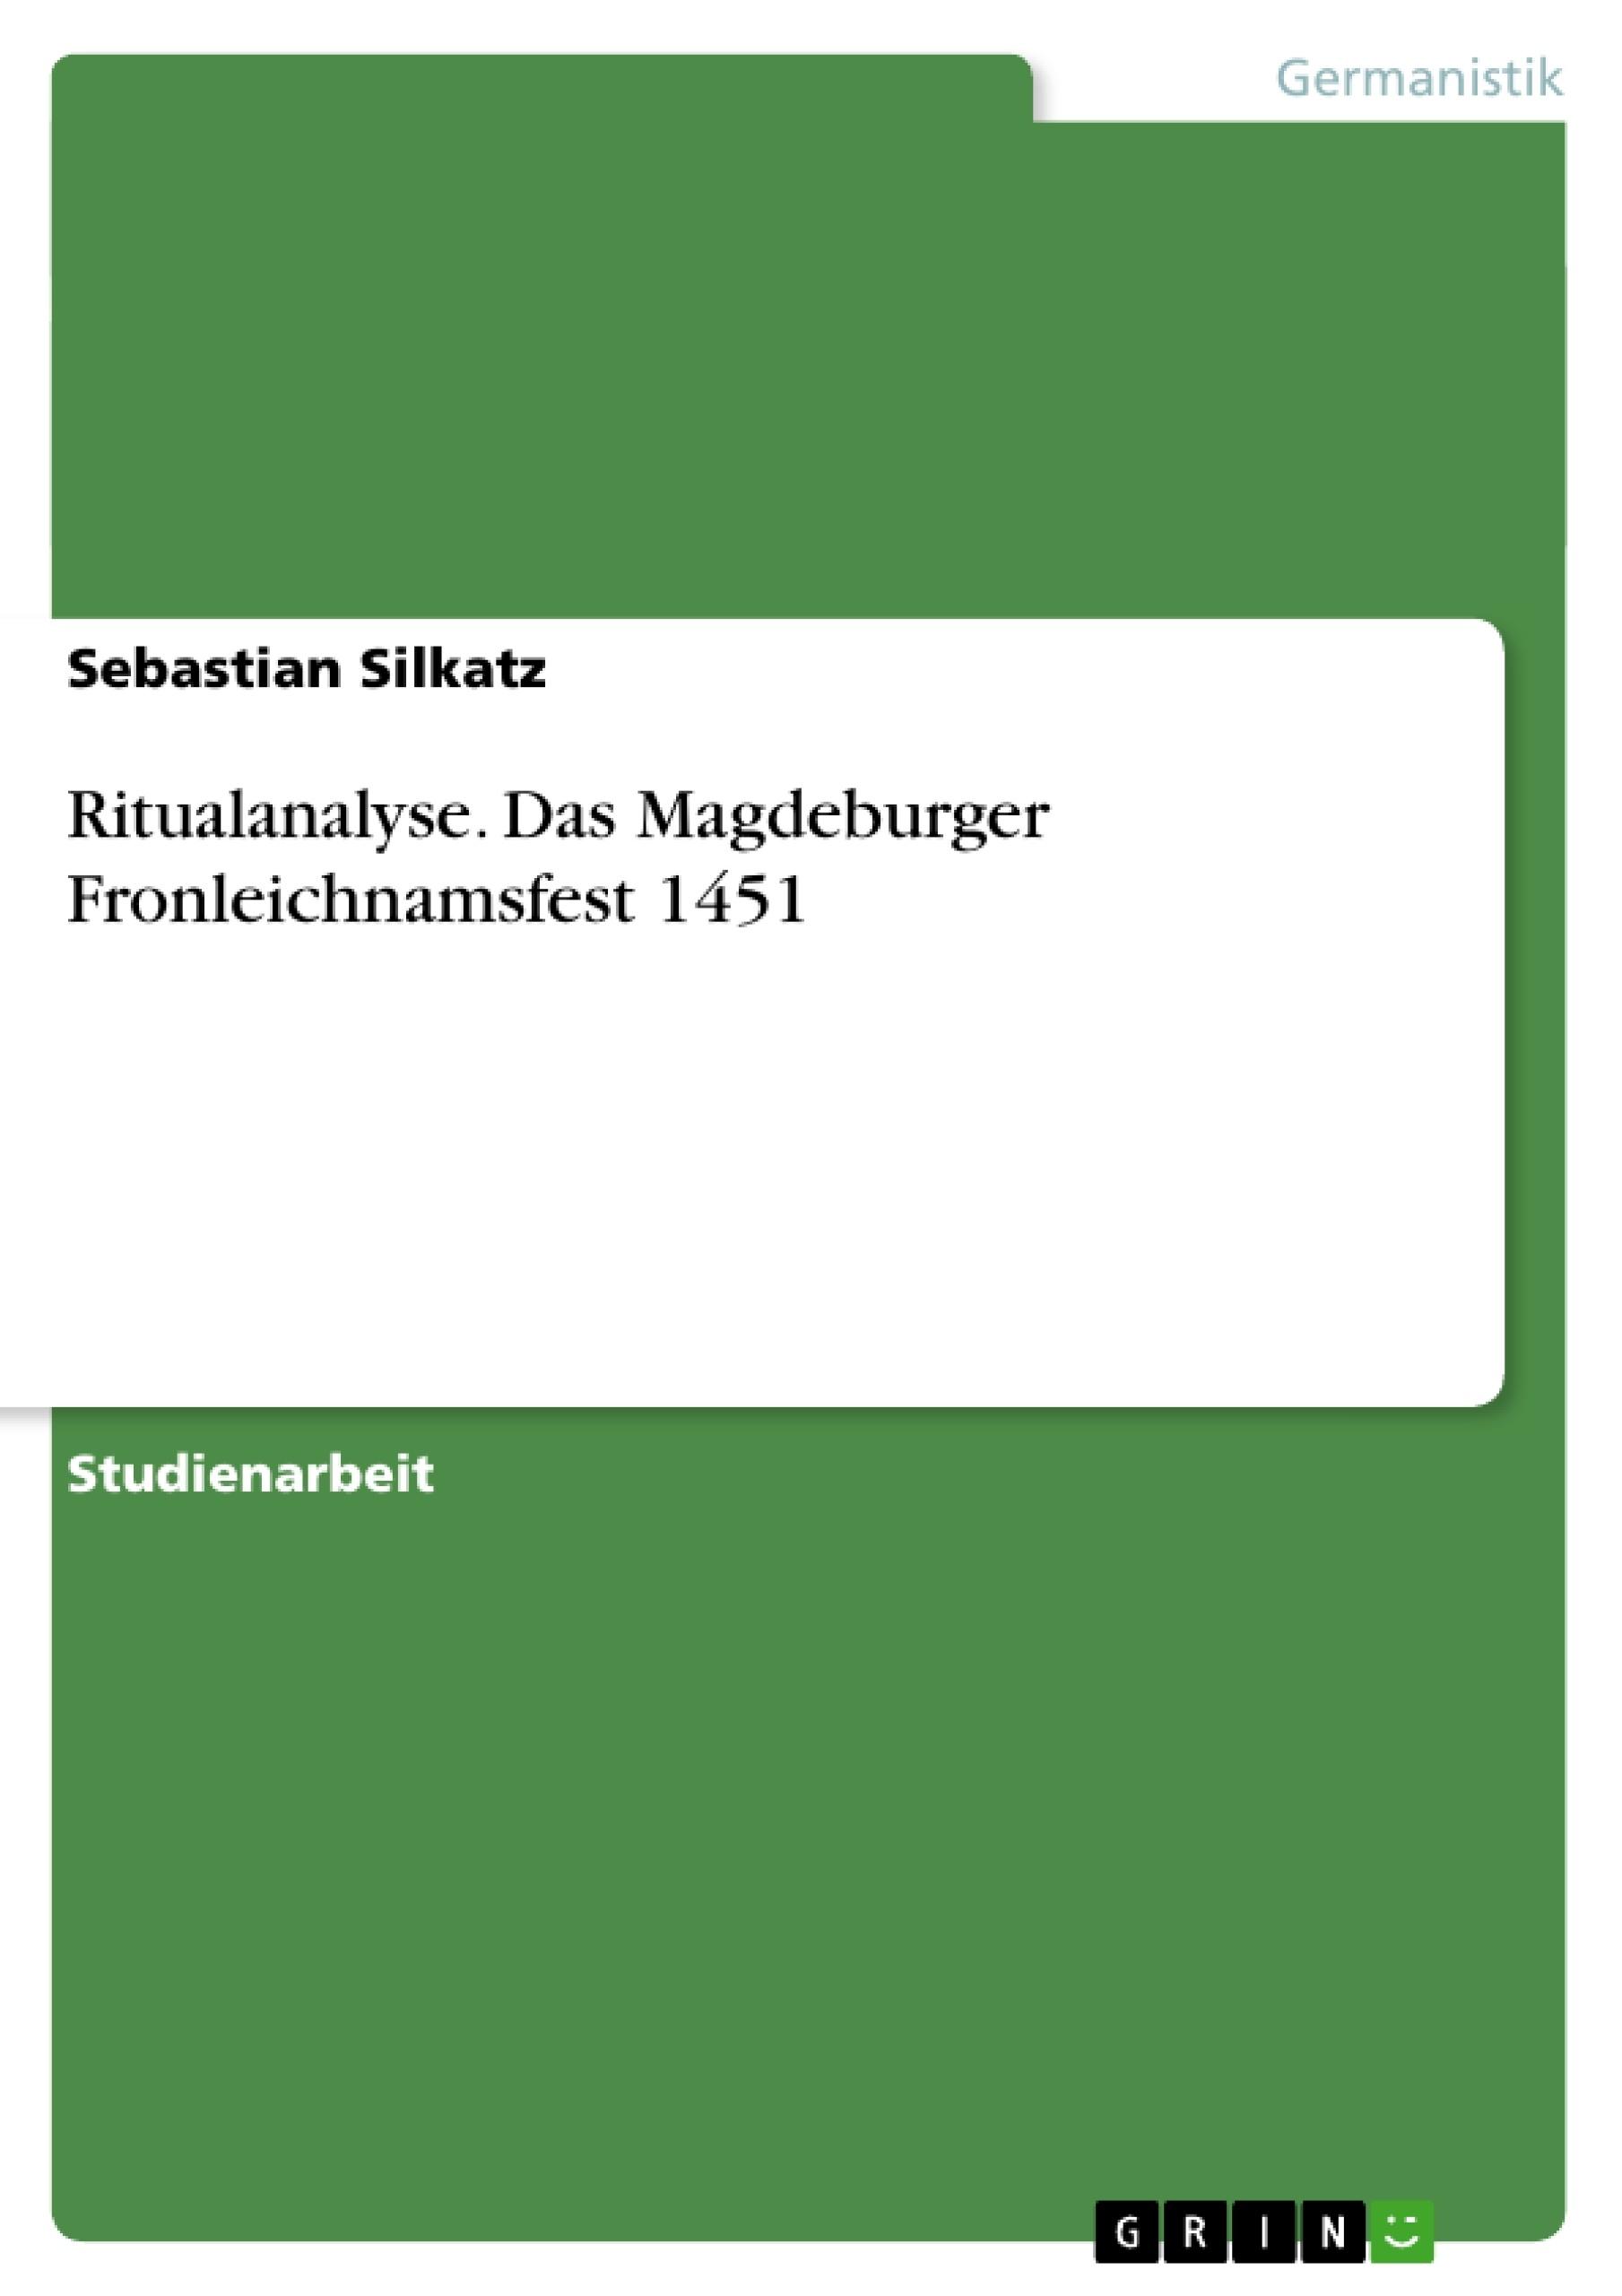 Titel: Ritualanalyse. Das Magdeburger Fronleichnamsfest 1451